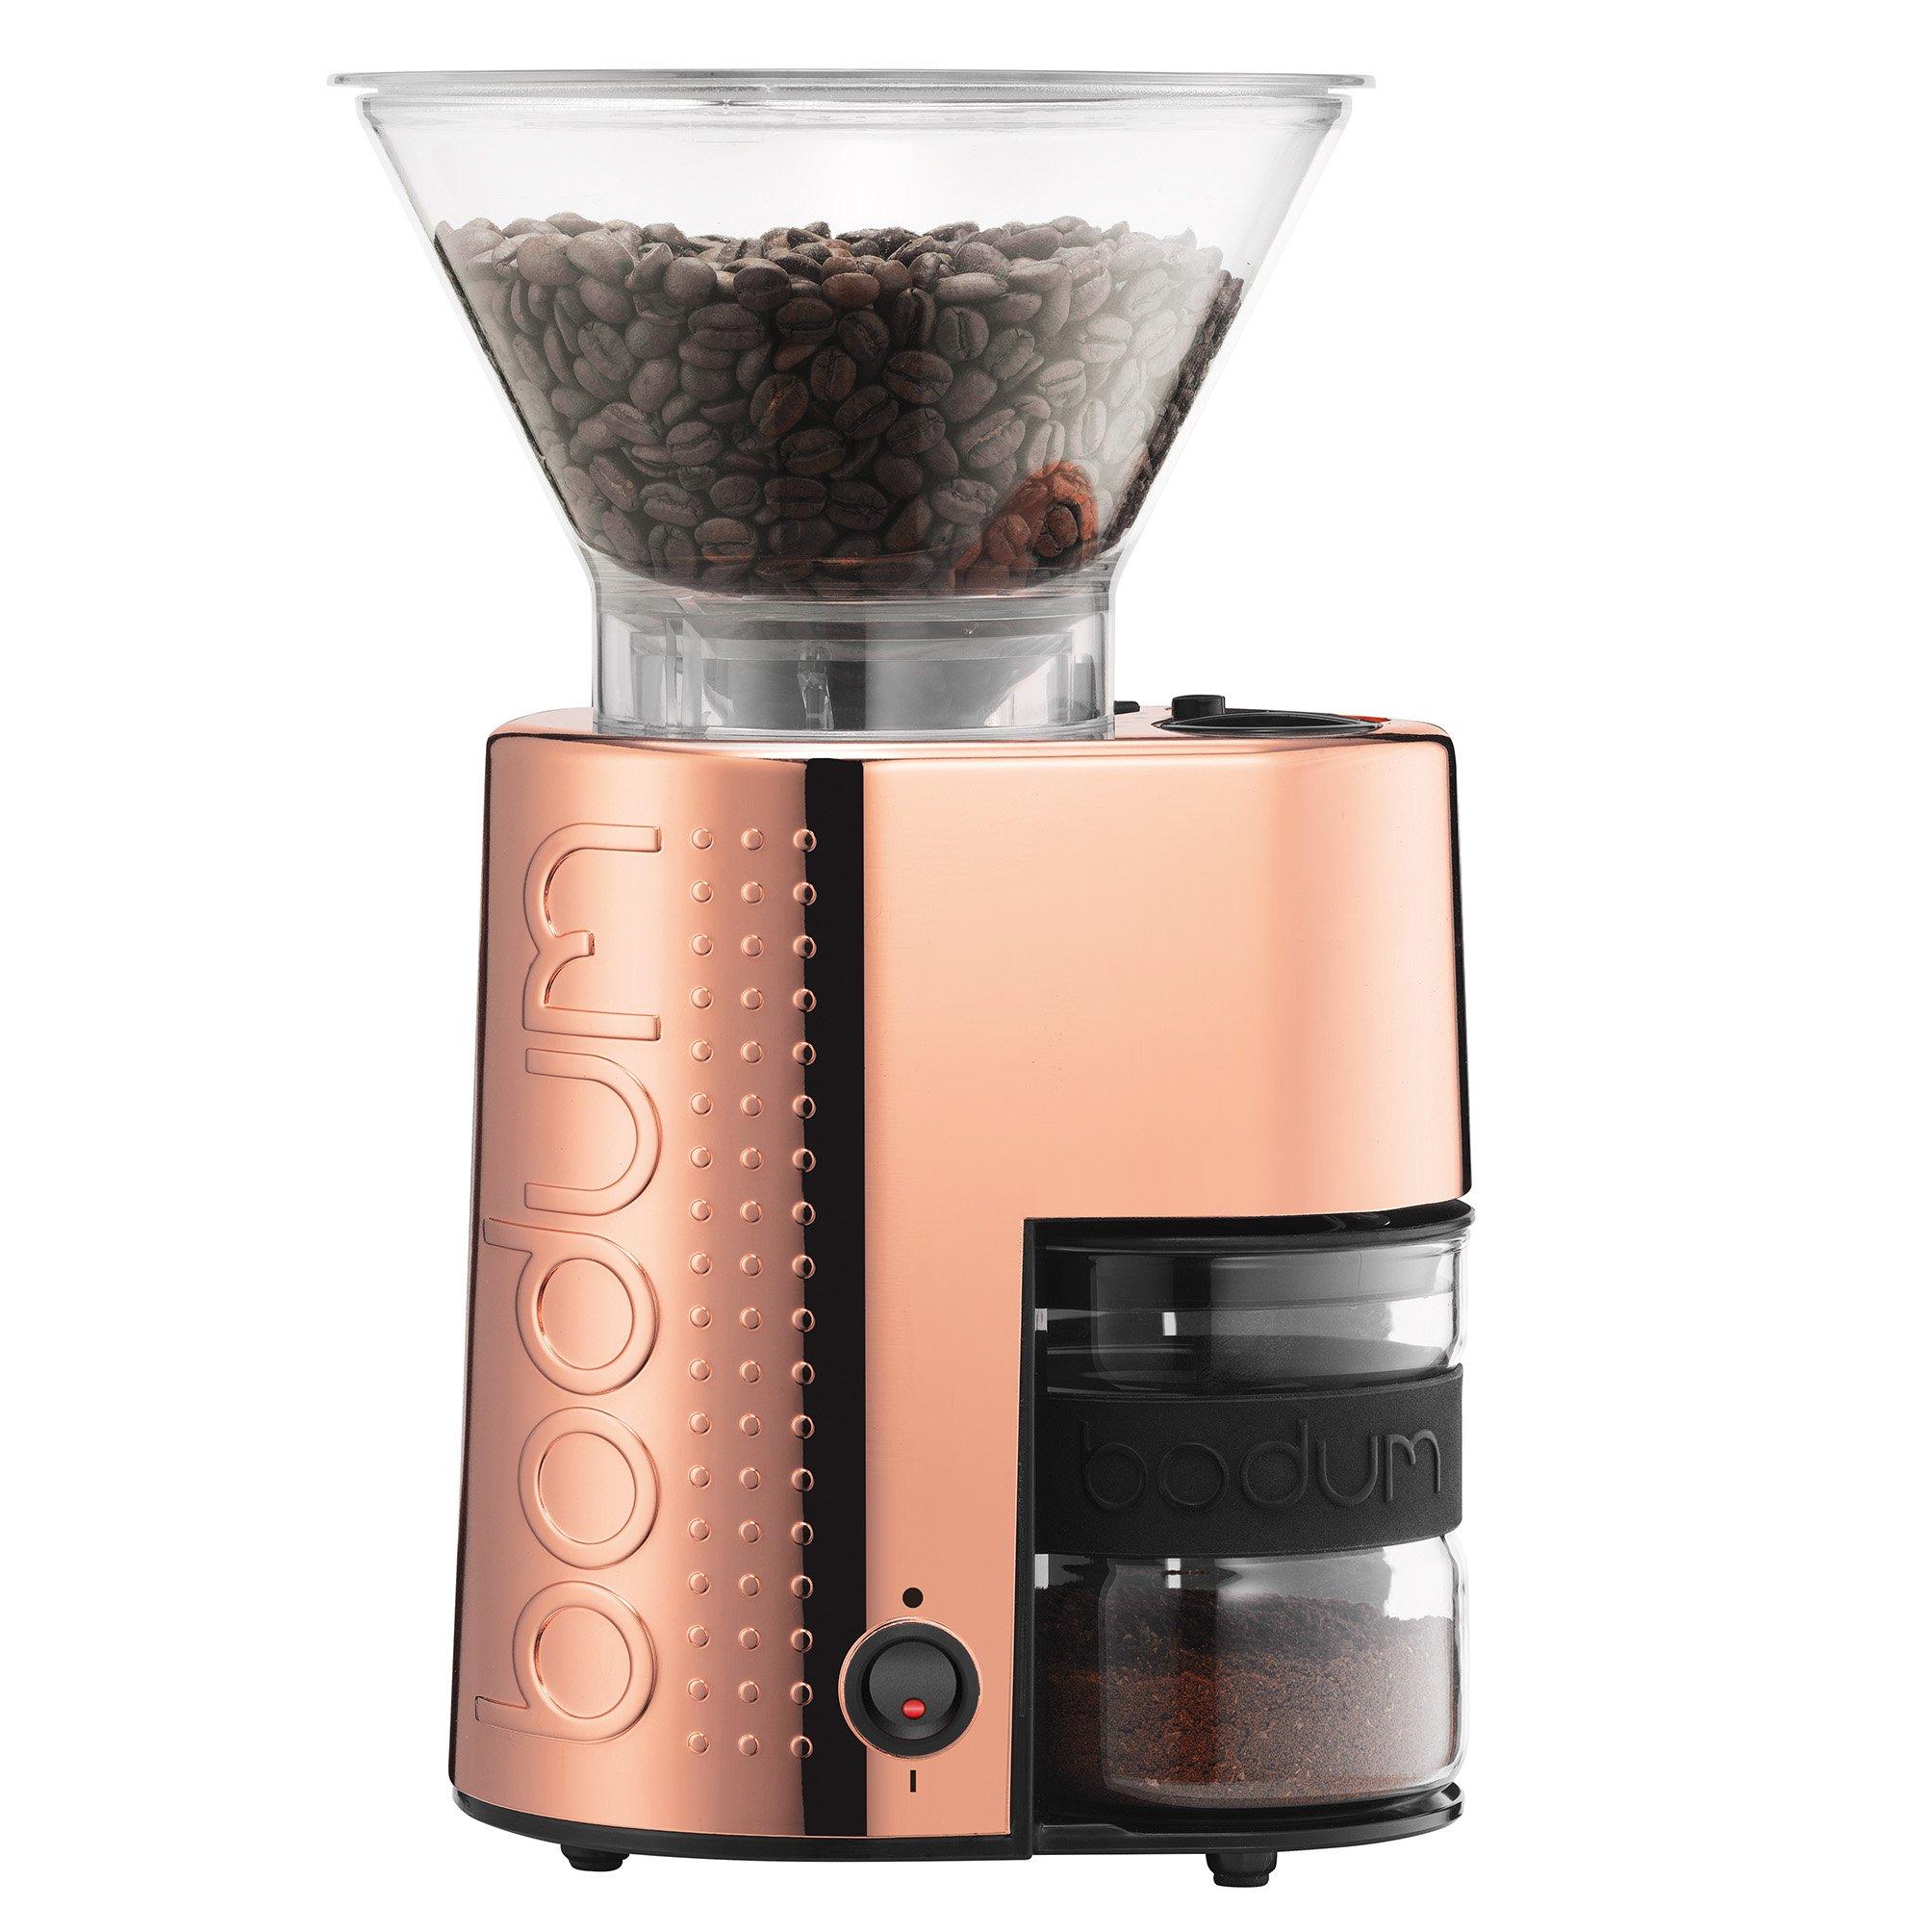 Bodum 10903-18US-1SB Bistro Coffee Grinder, Shiny Copper